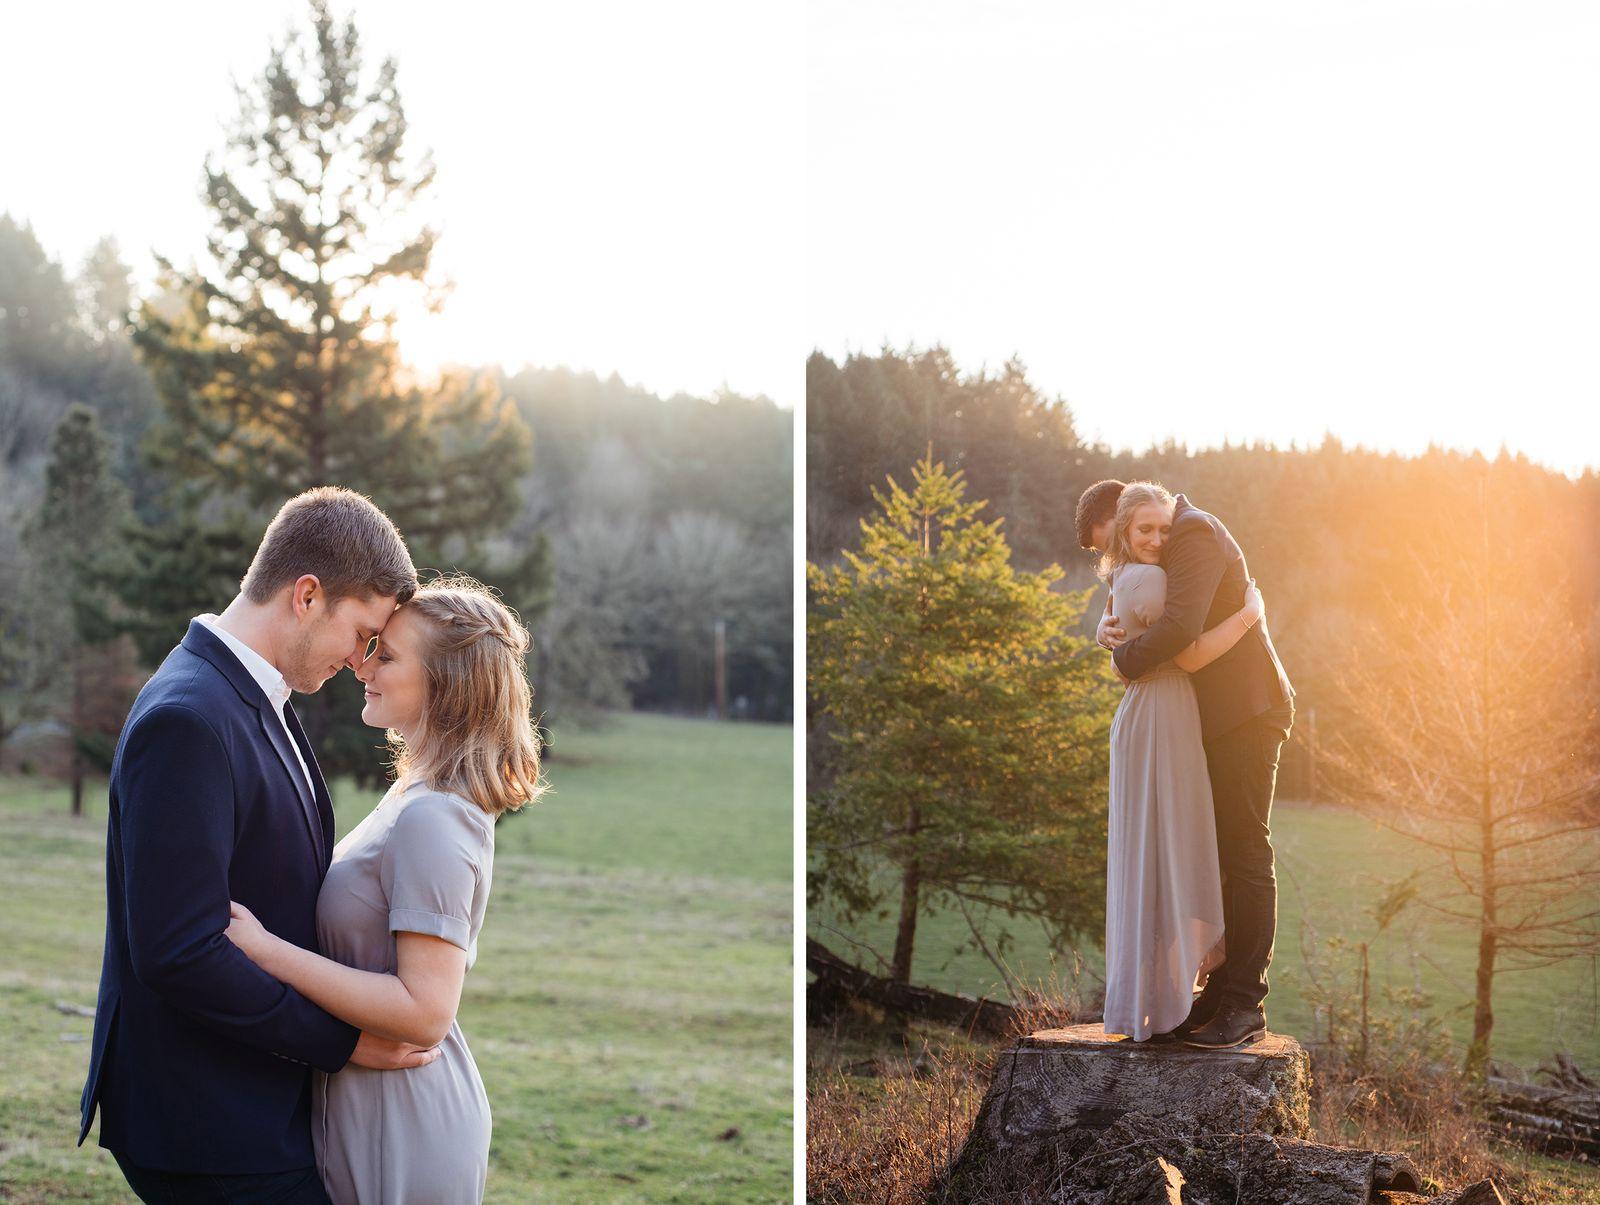 Winter engagement photos in Oregon